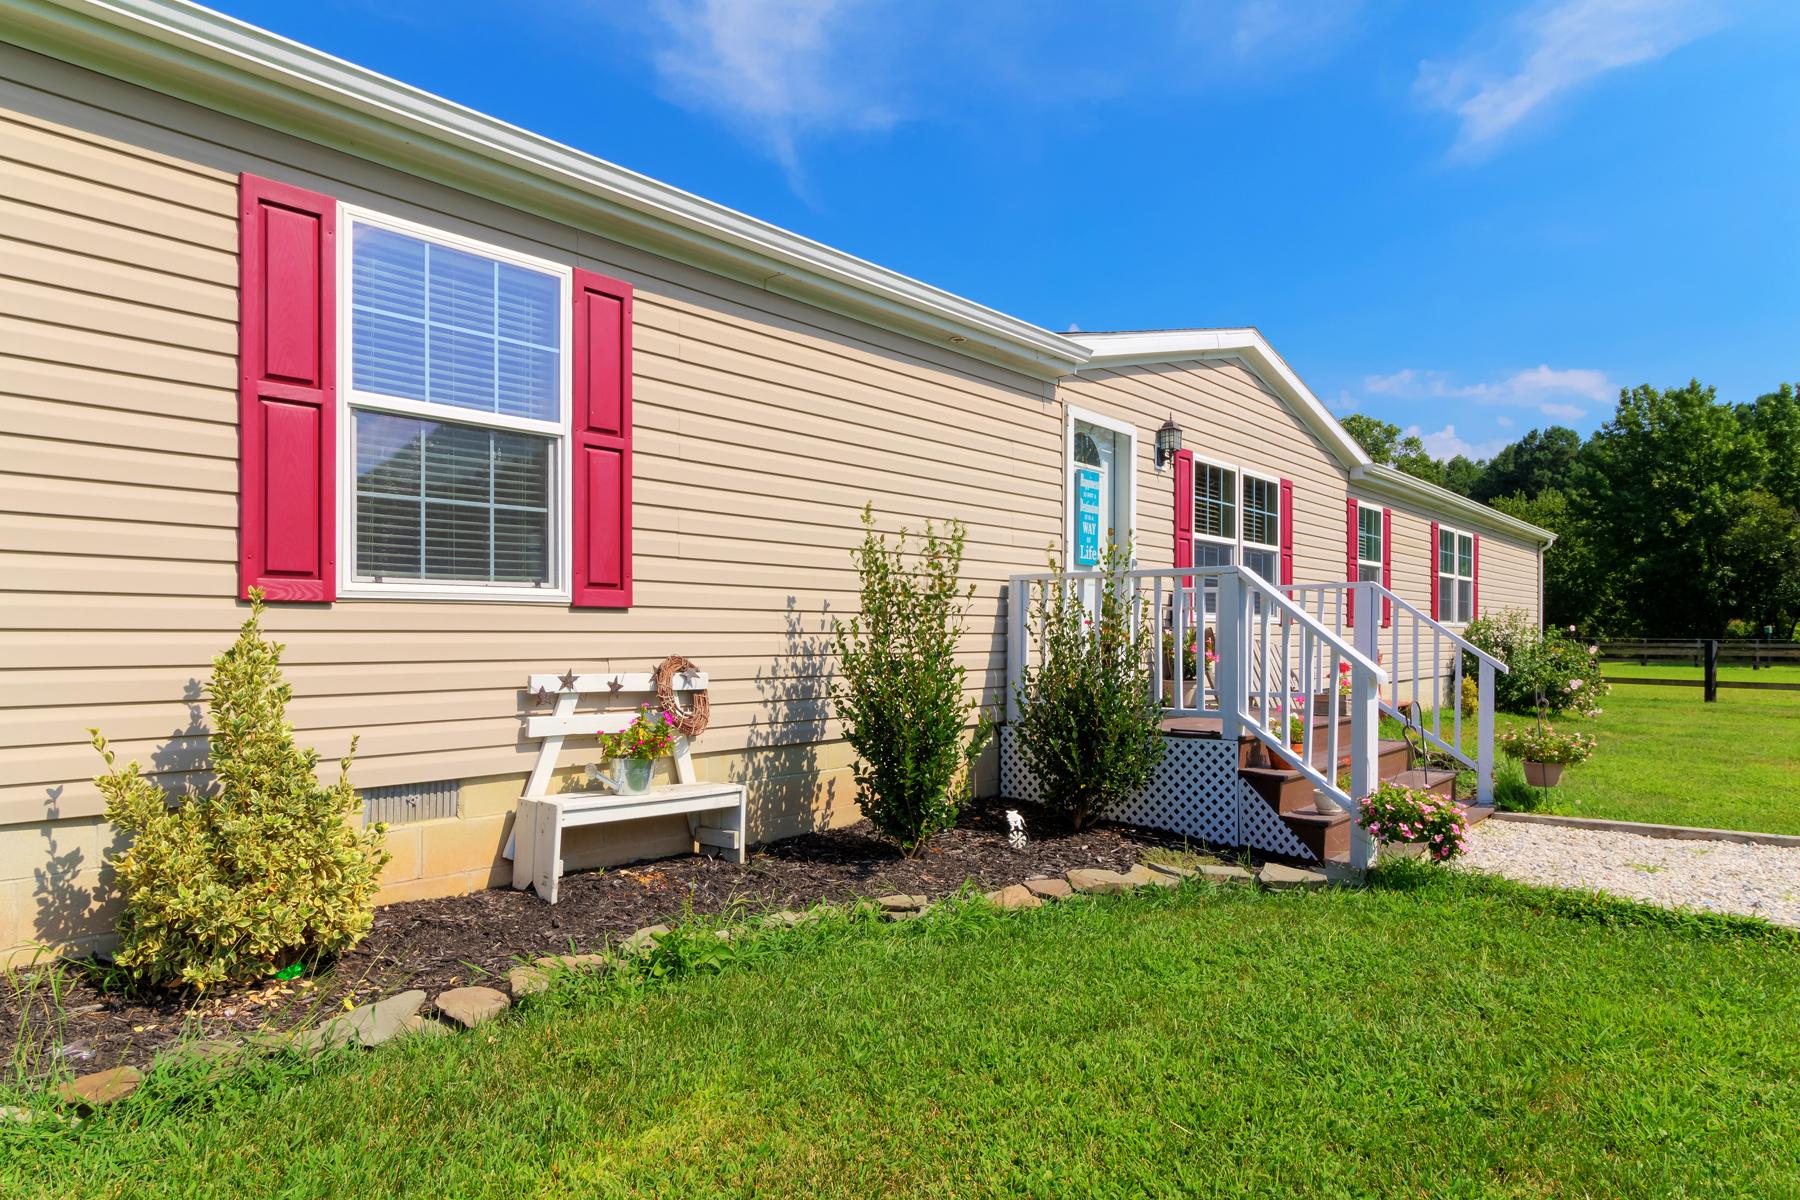 独户住宅 为 销售 在 36255 Circle J Farm Rd , Selbyville, DE 19975 36255 Circle J Farm Rd Selbyville, Delaware 19975 United States